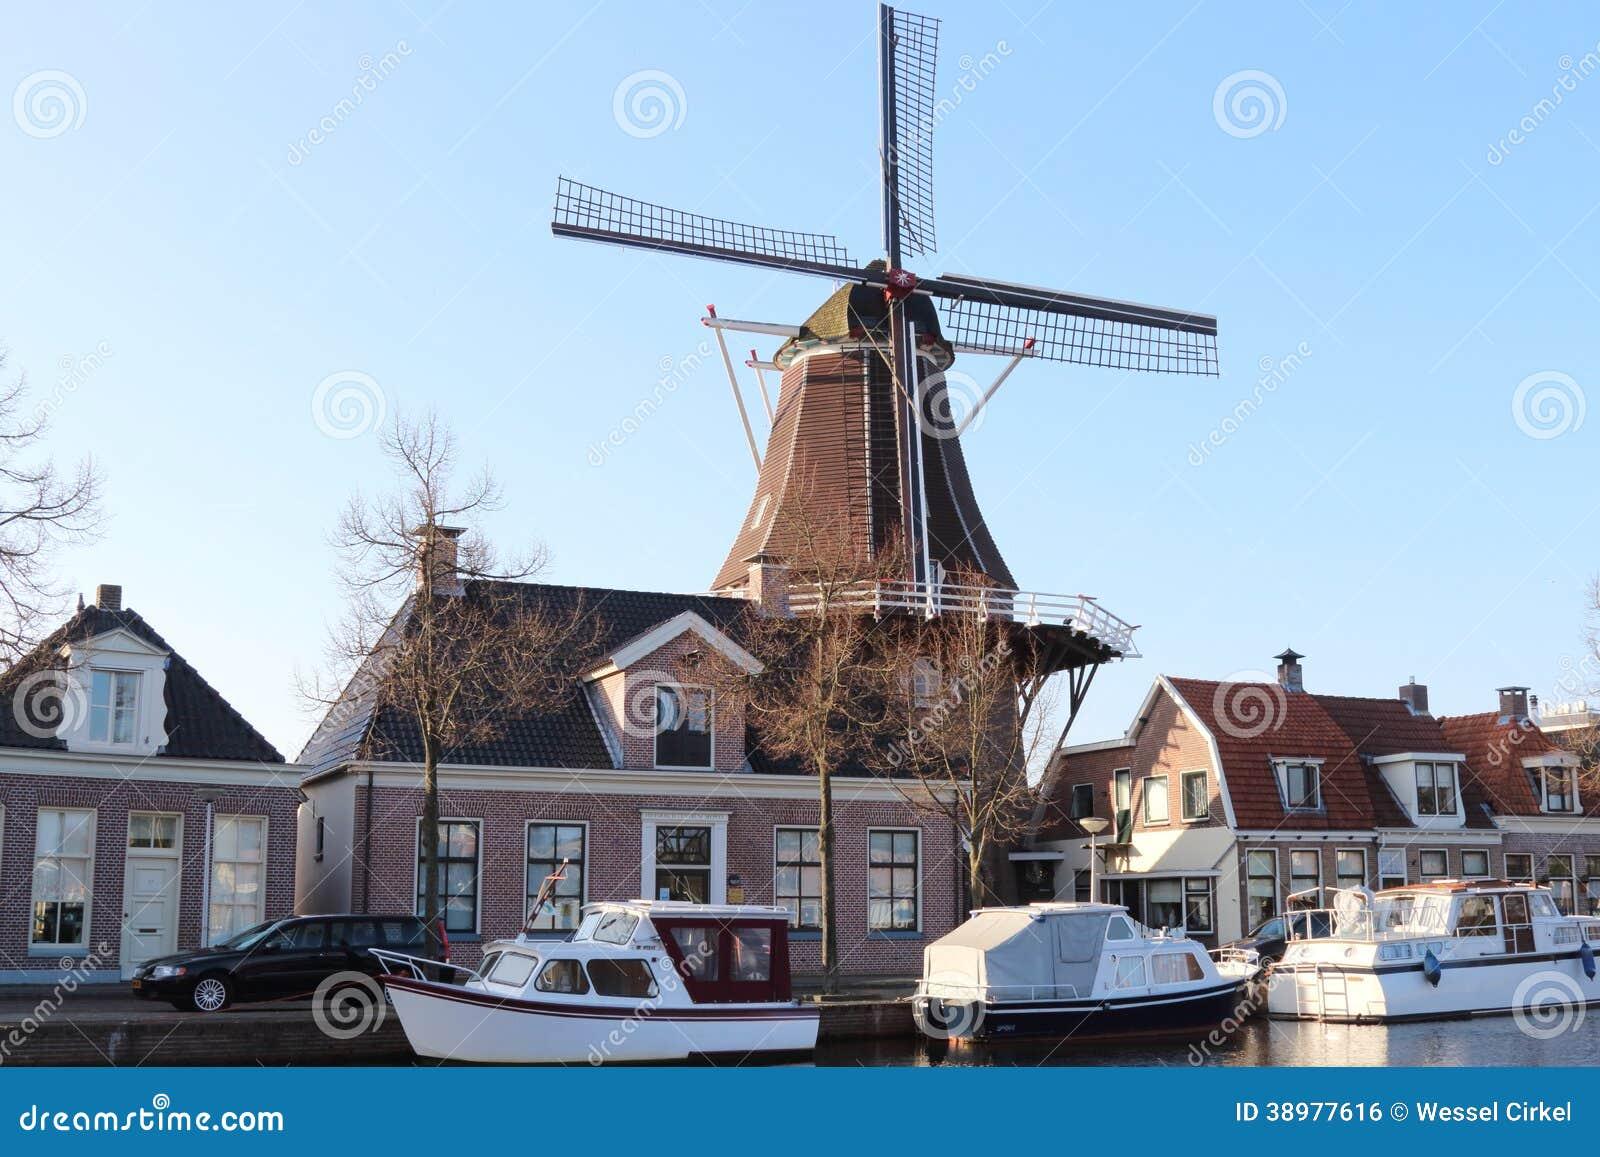 Crossfit Meppel - Netherlands | BOXROX